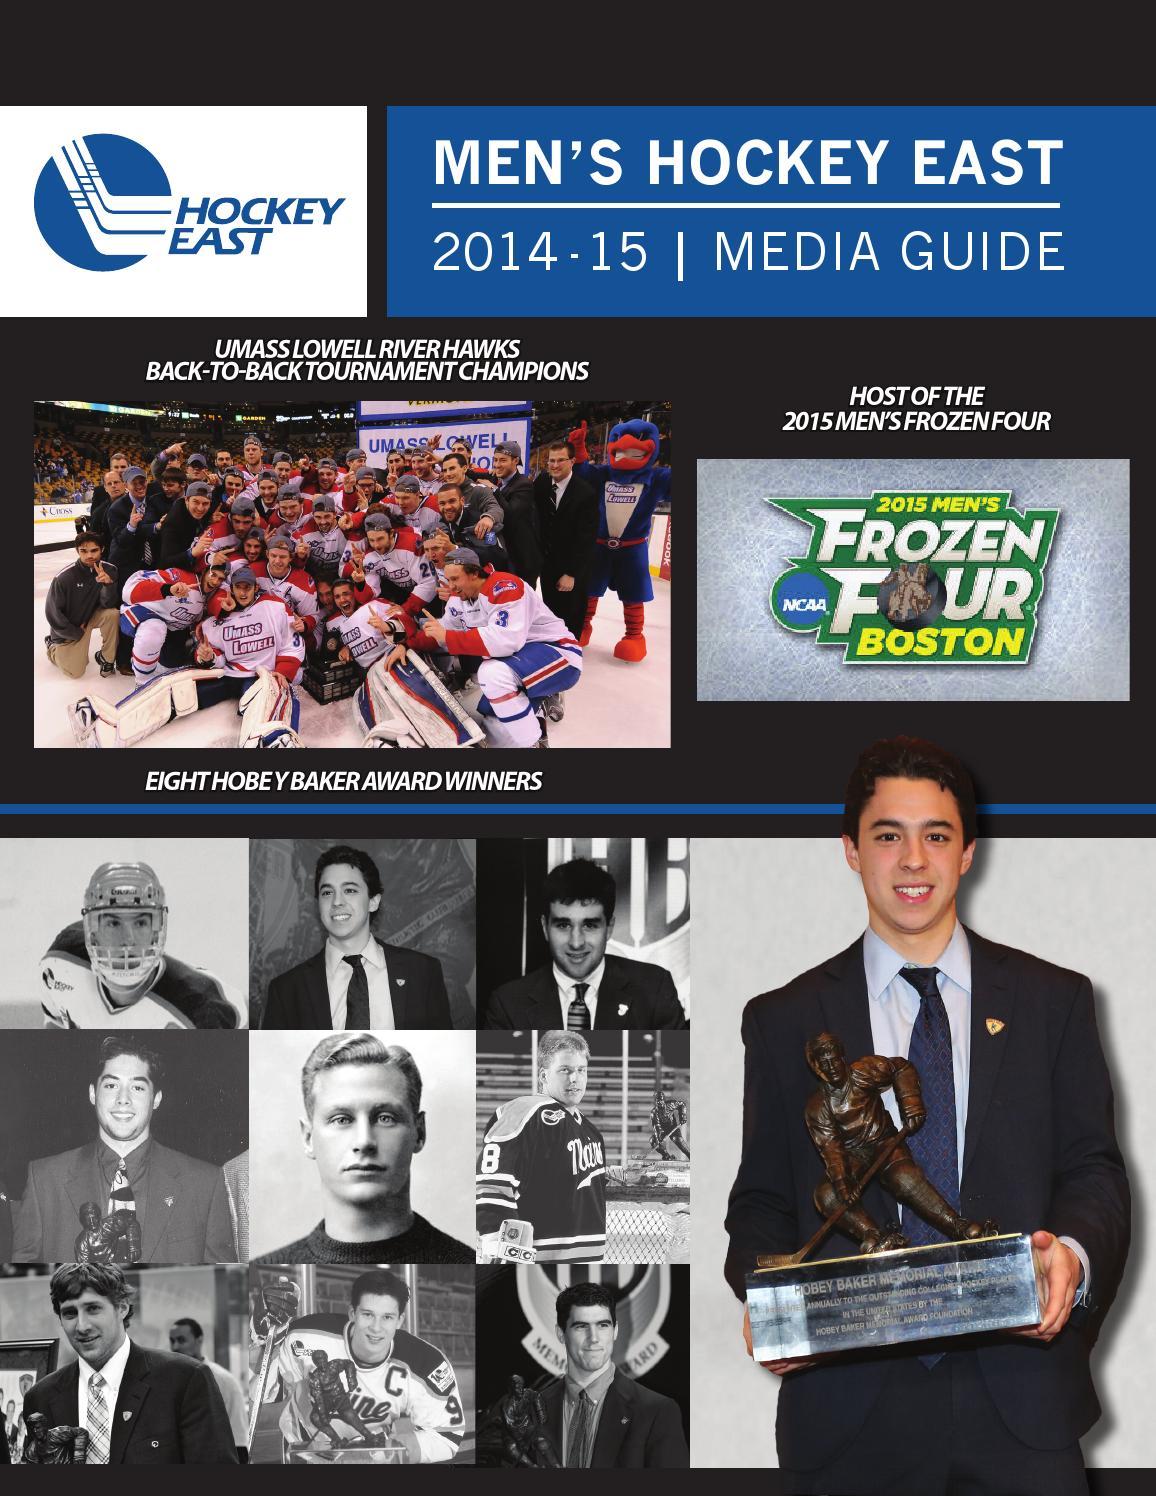 2014 15 hockey east men s media guide by hockey east